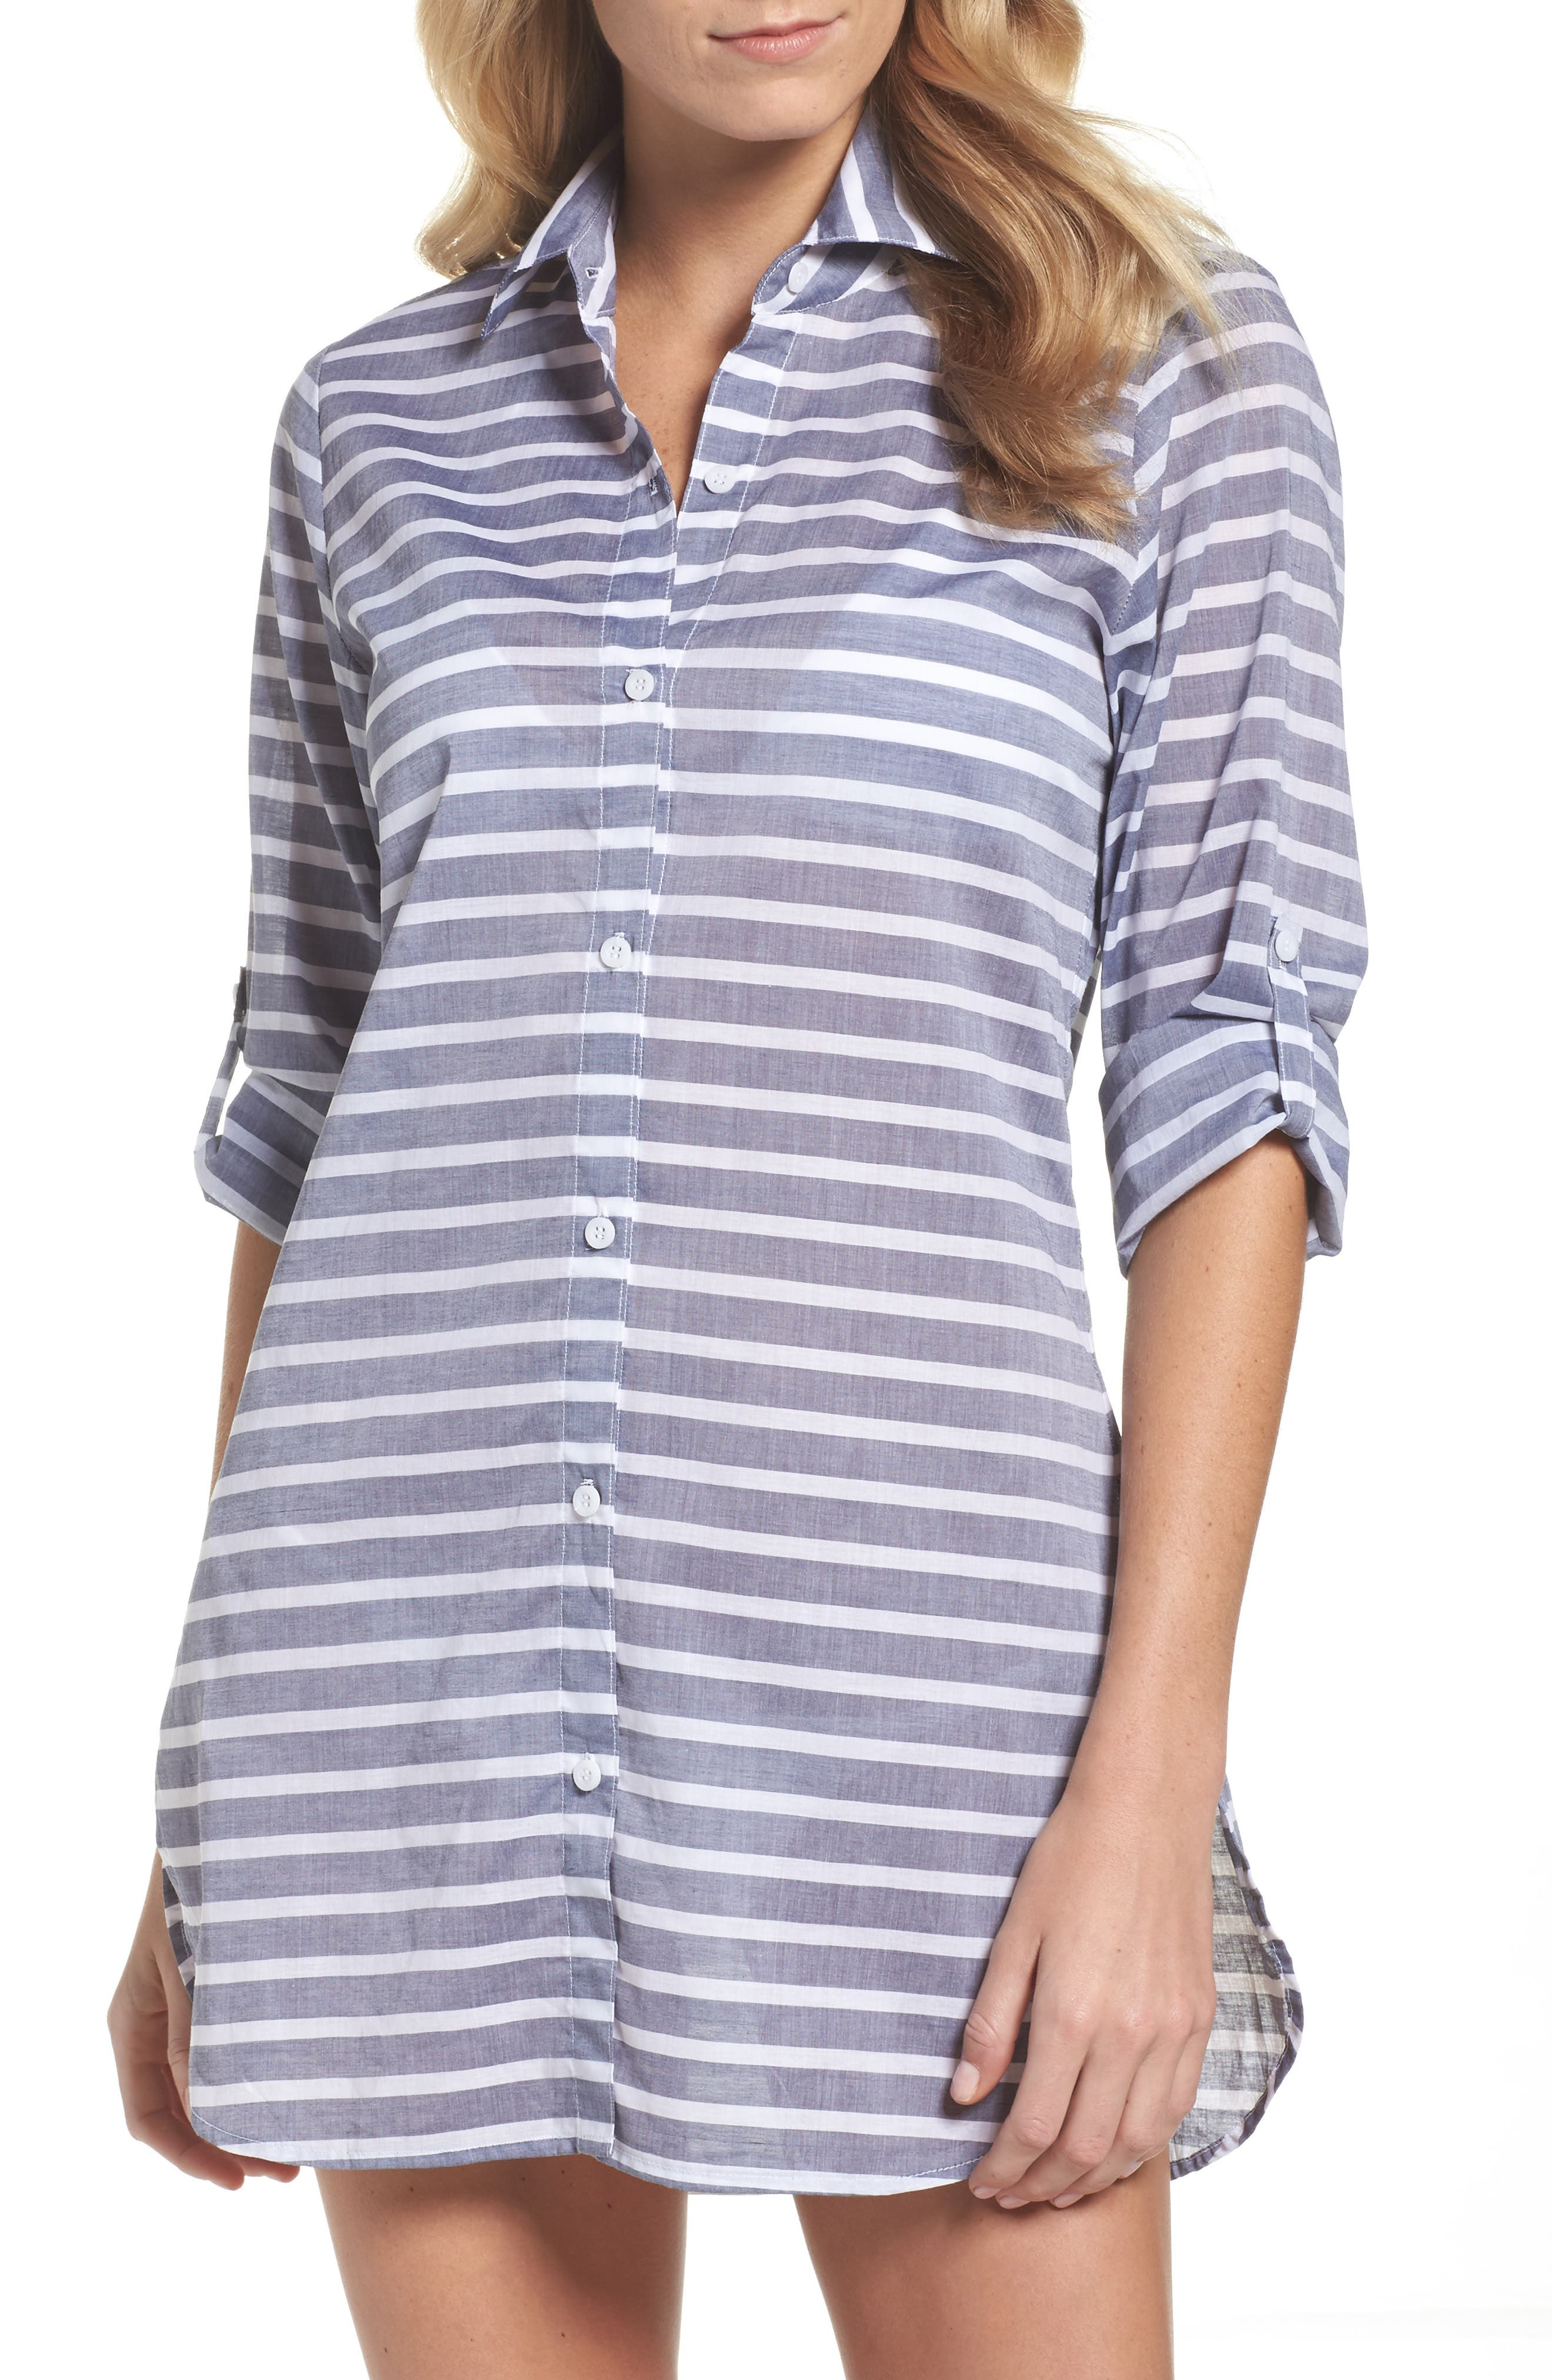 Alternate Image 1 Selected - Tommy Bahama Brenton Stripe Boyfriend Shirt Cover-Up